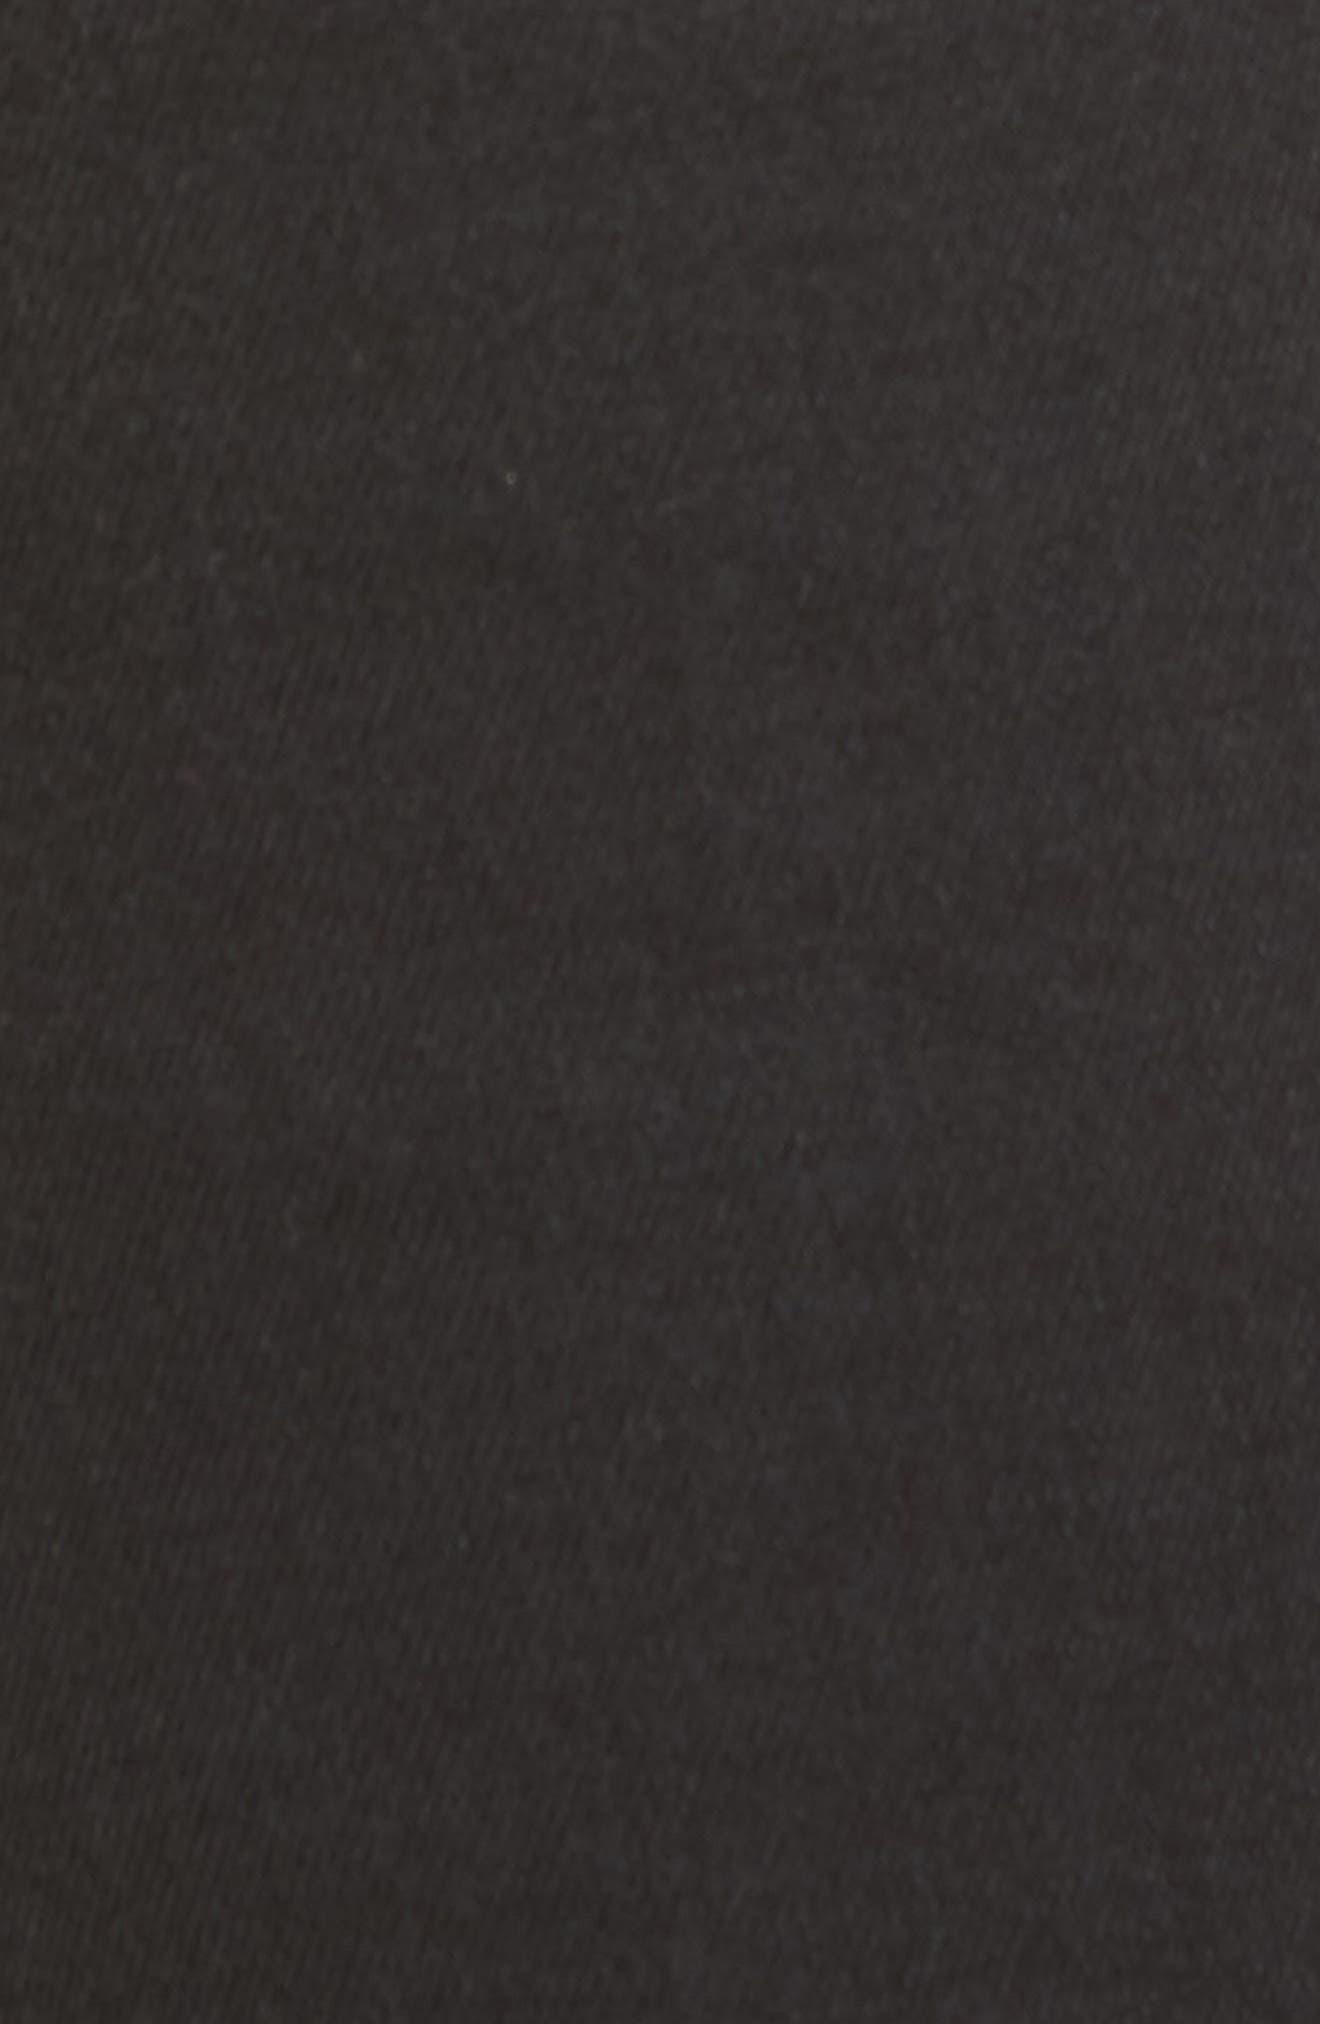 Donna Skinny Jeans,                             Alternate thumbnail 5, color,